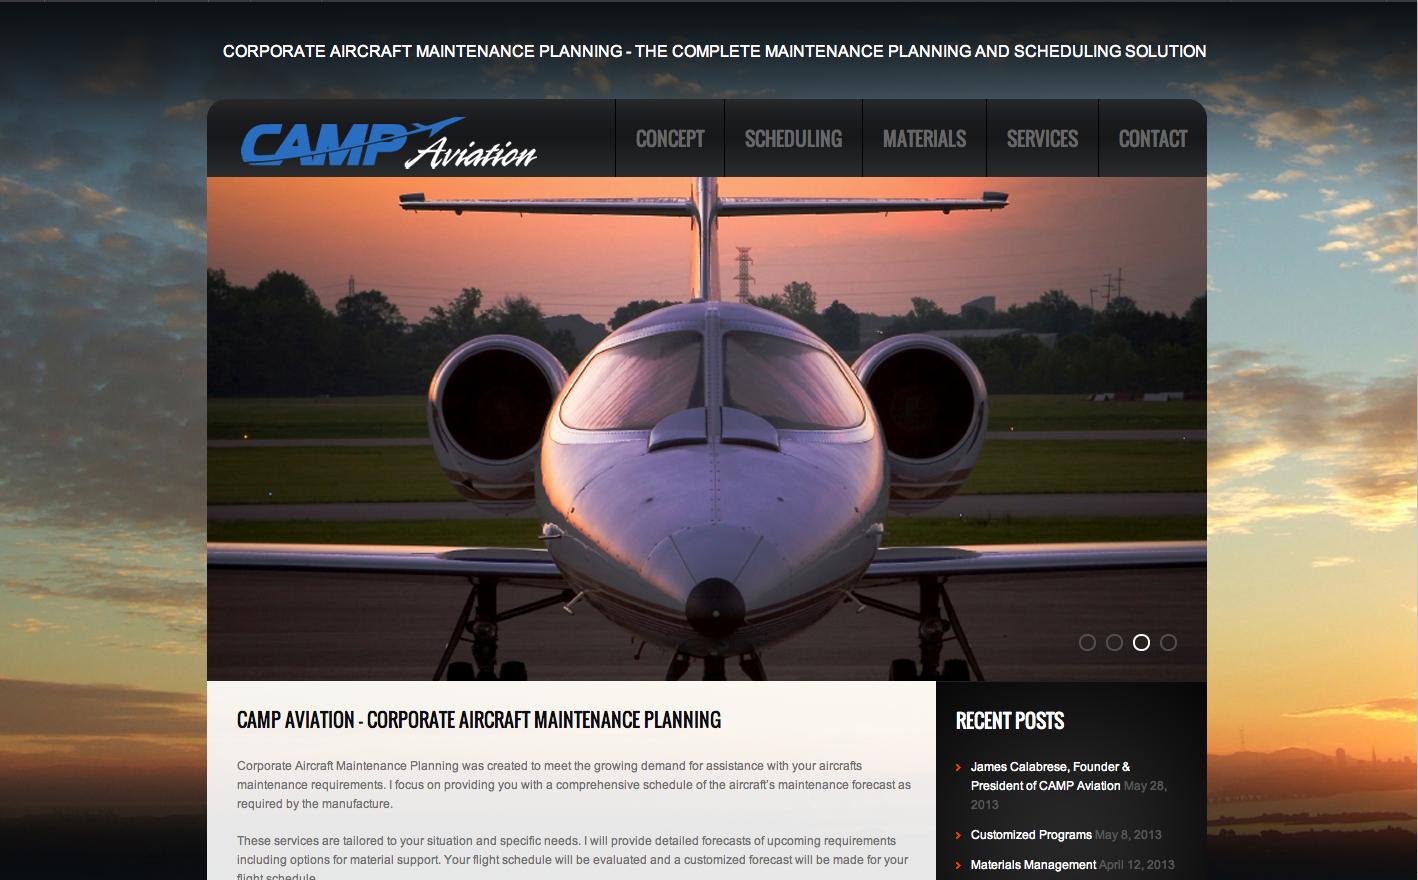 CAMP Aviation